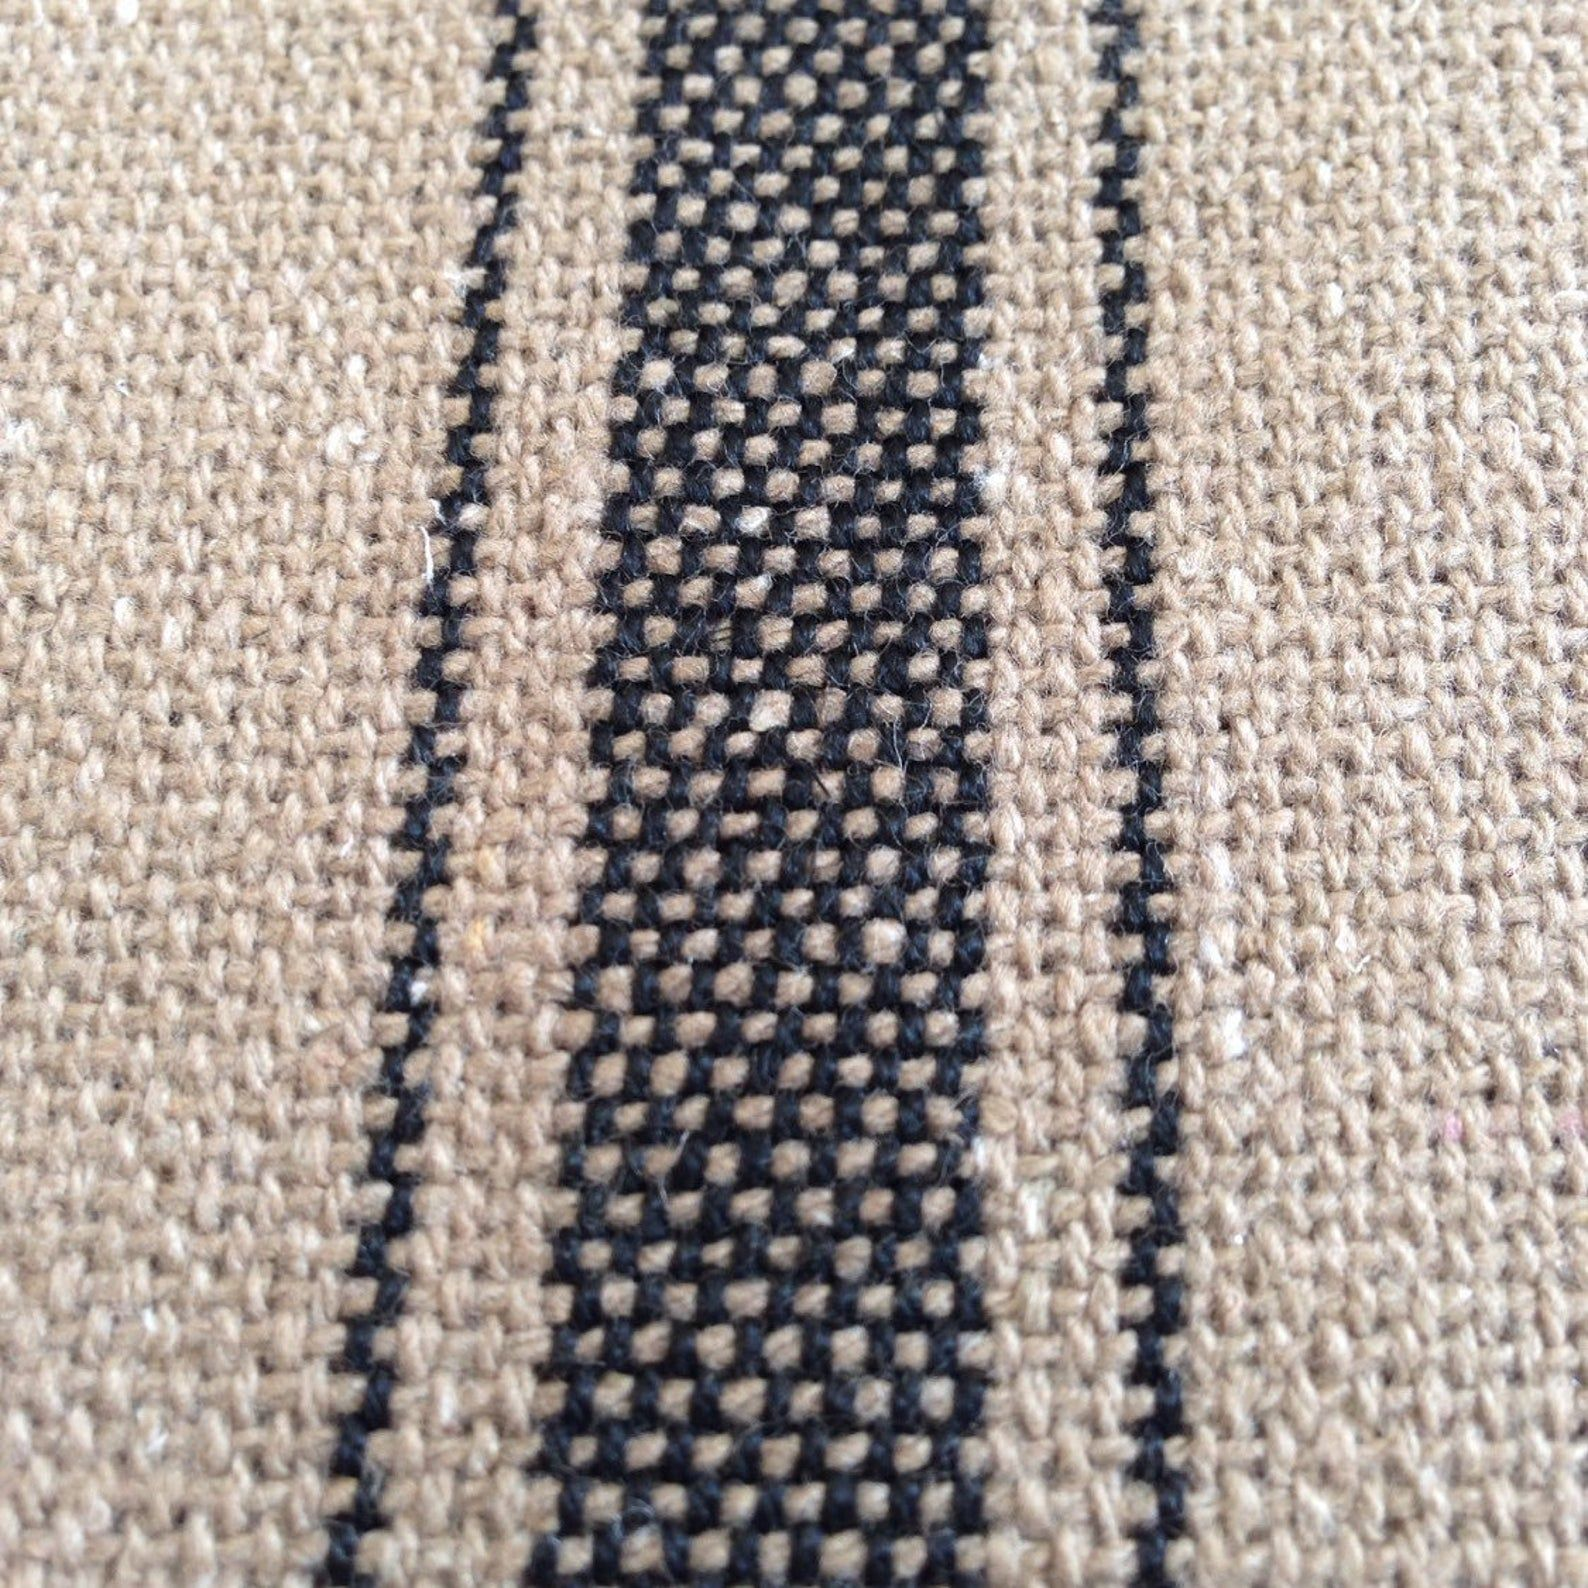 Grain Sack Fabric By The Yard Black Stripe On Dark Tan Grain   Etsy